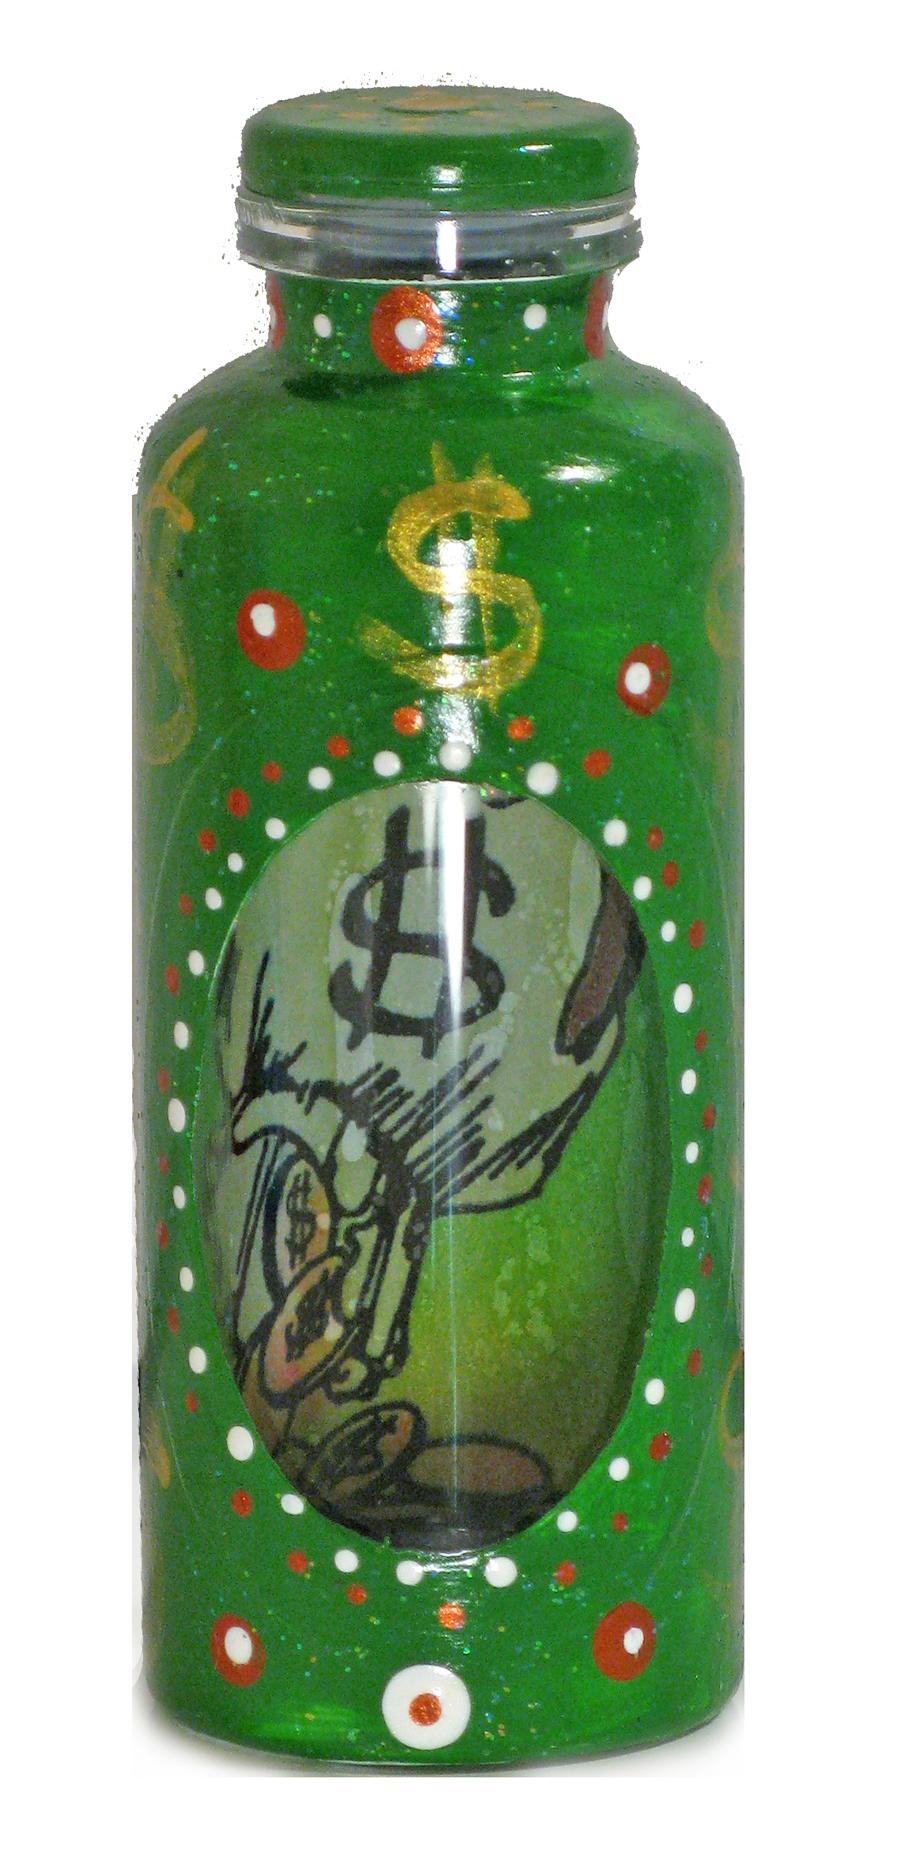 Lucky Mojo Curio Co.: Hoodoo Bottle Spell - Prosperity